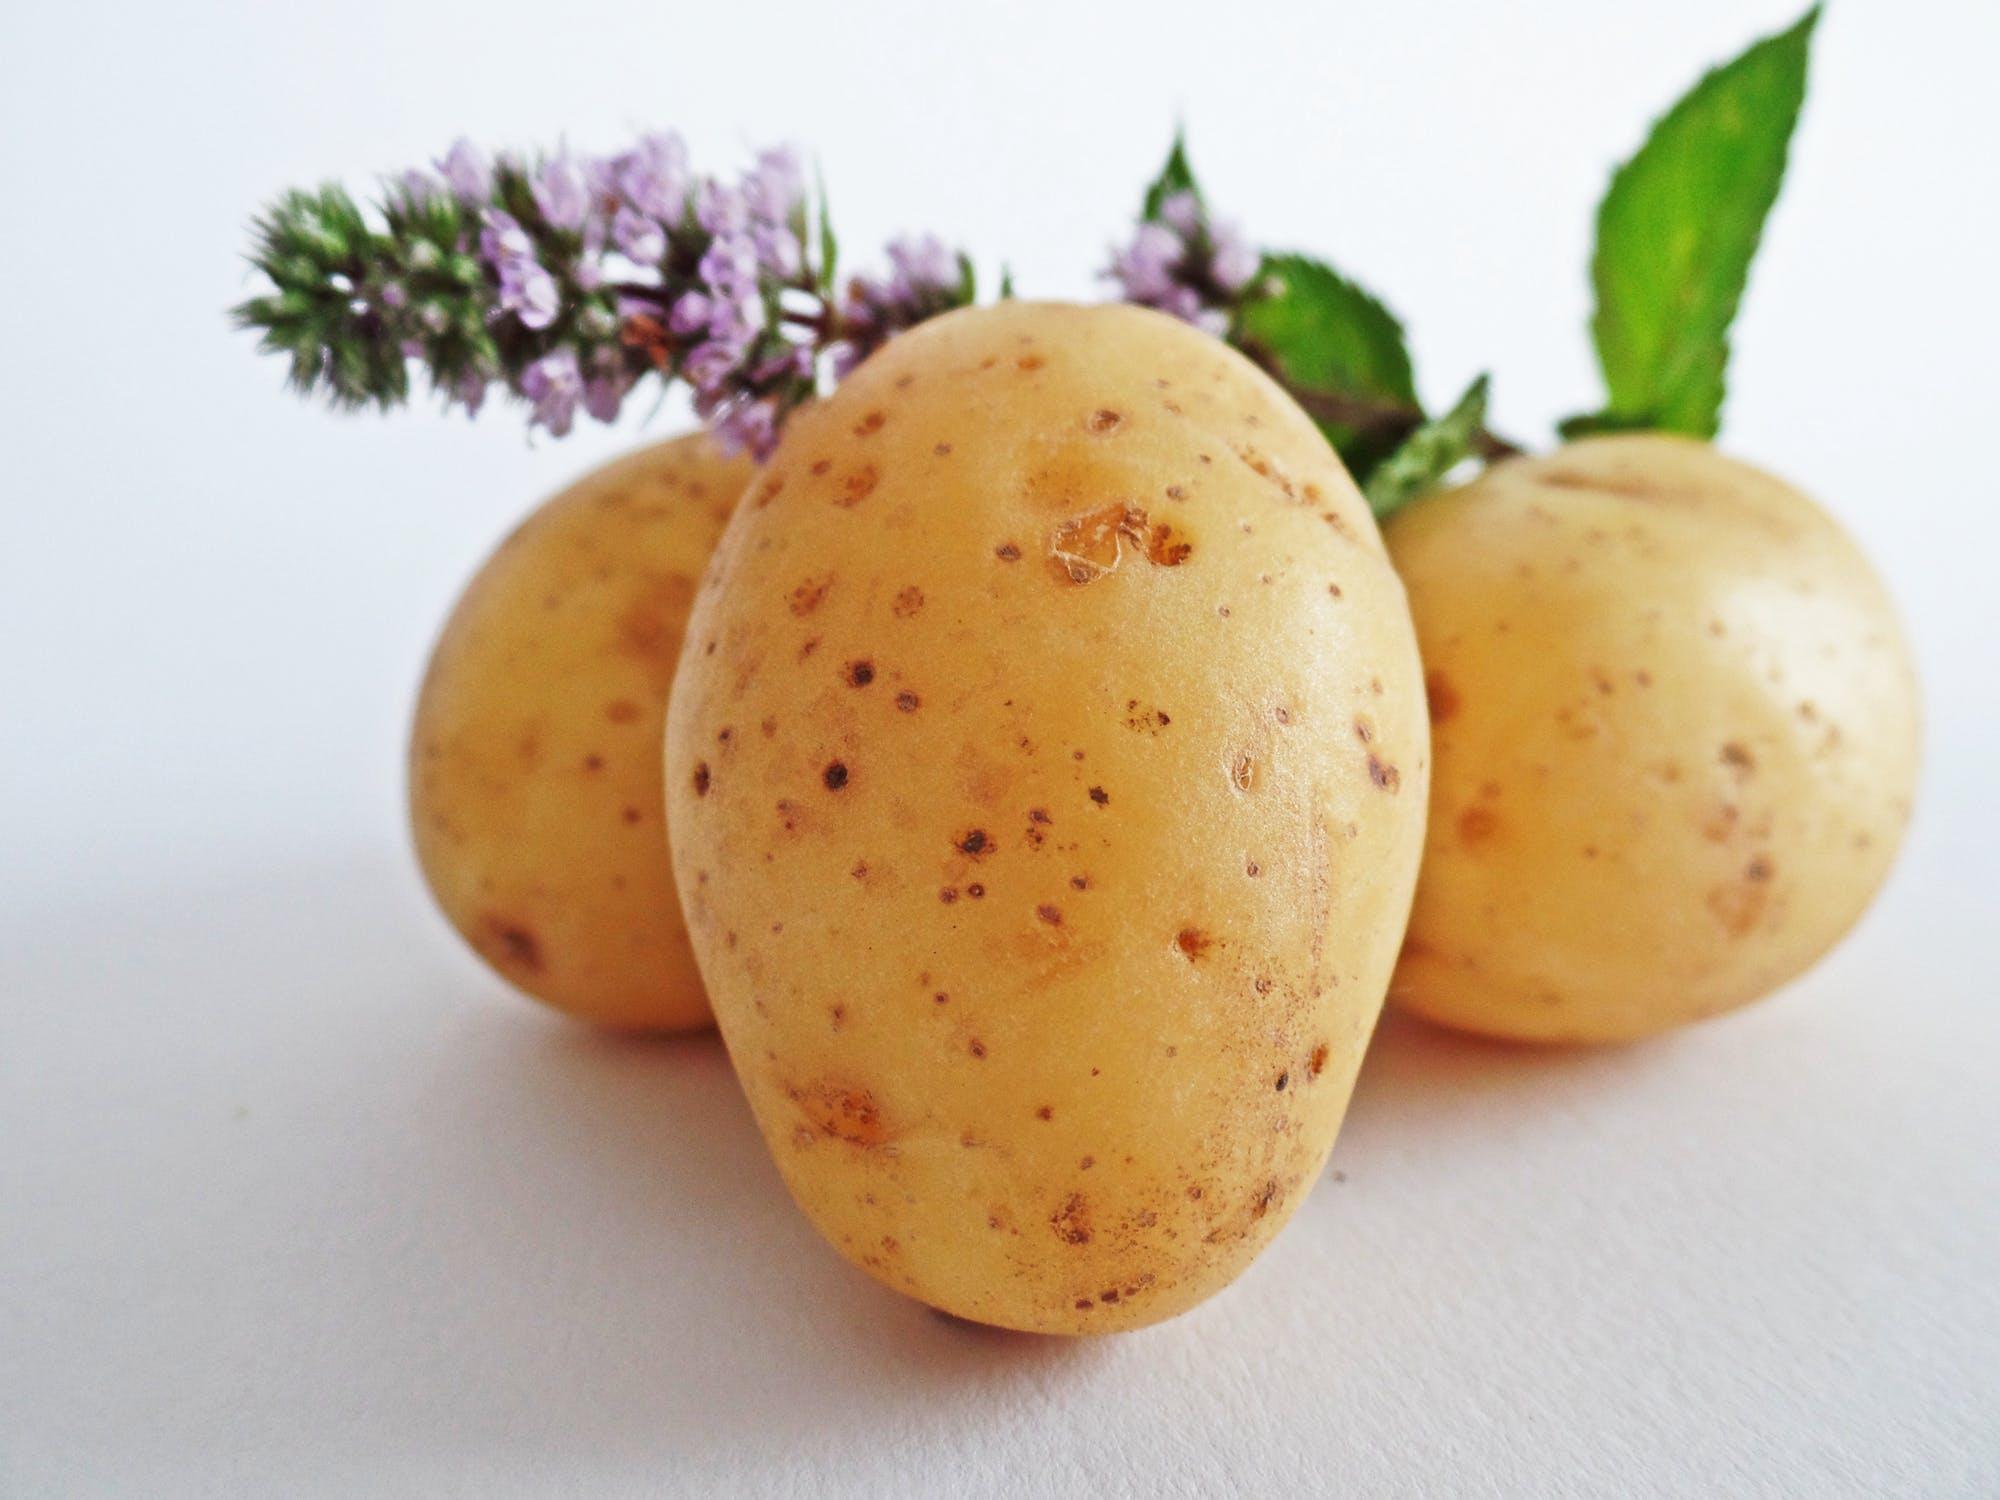 Save on Seasonal Produce in December